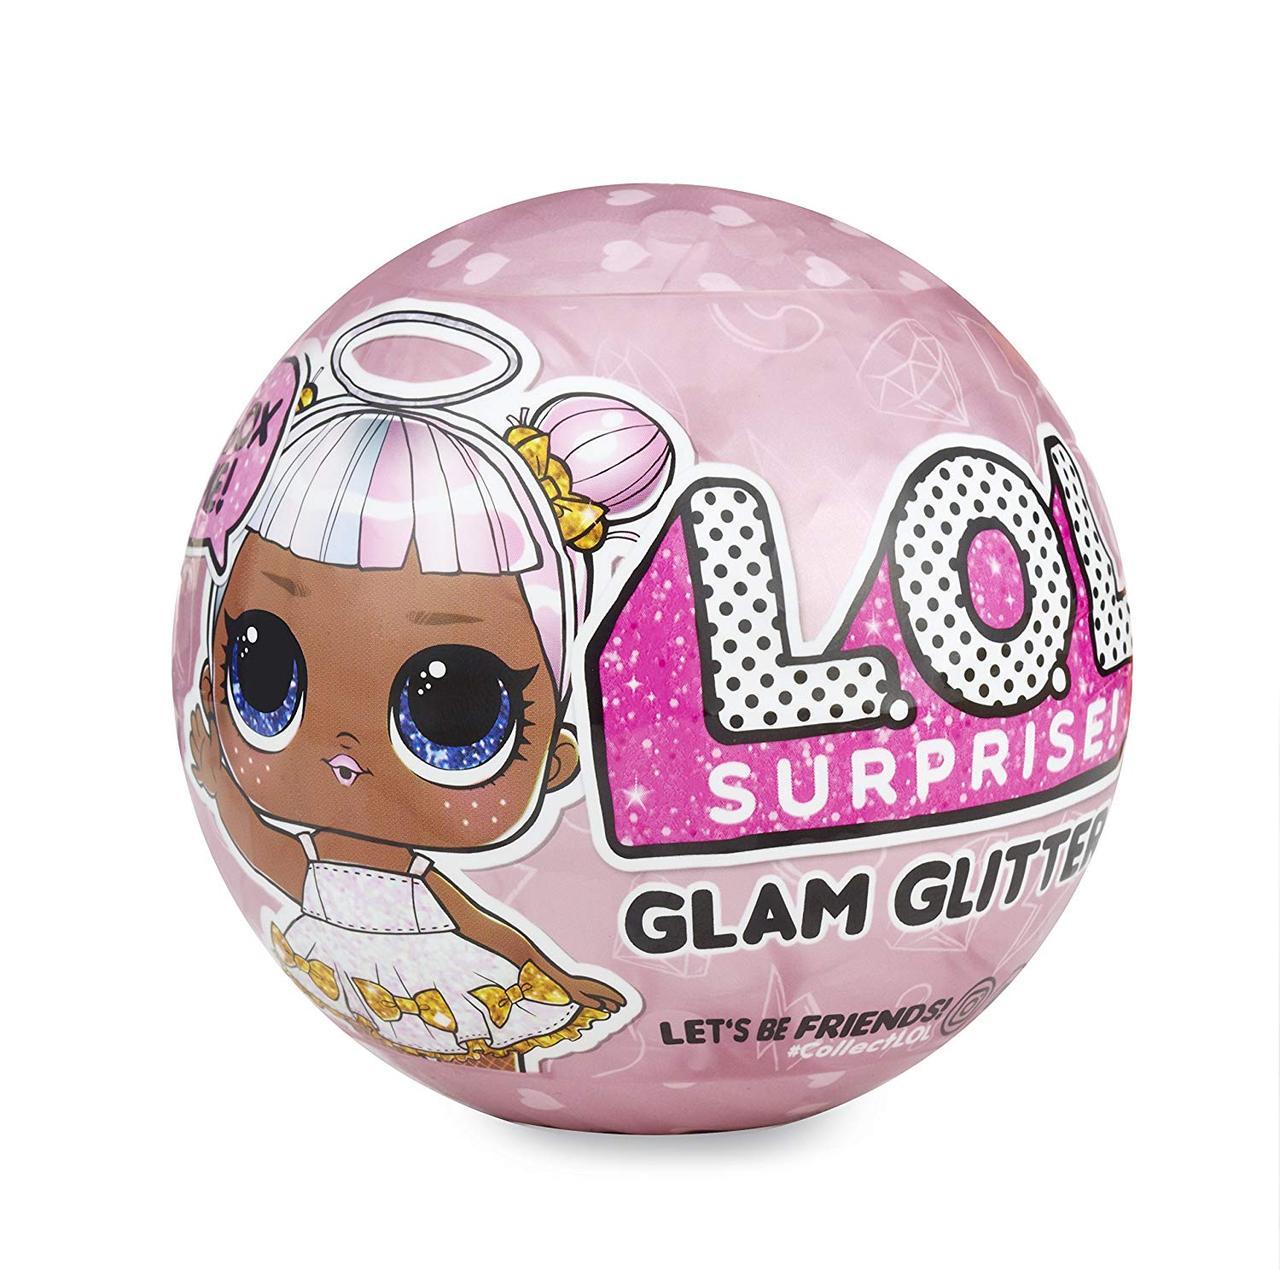 ЛОЛ Сюрприз!Оригинал! Блестящая серия Глэм Глиттер L.O.L. Surprise! Glam Glitter Series Doll with 7 Surprises